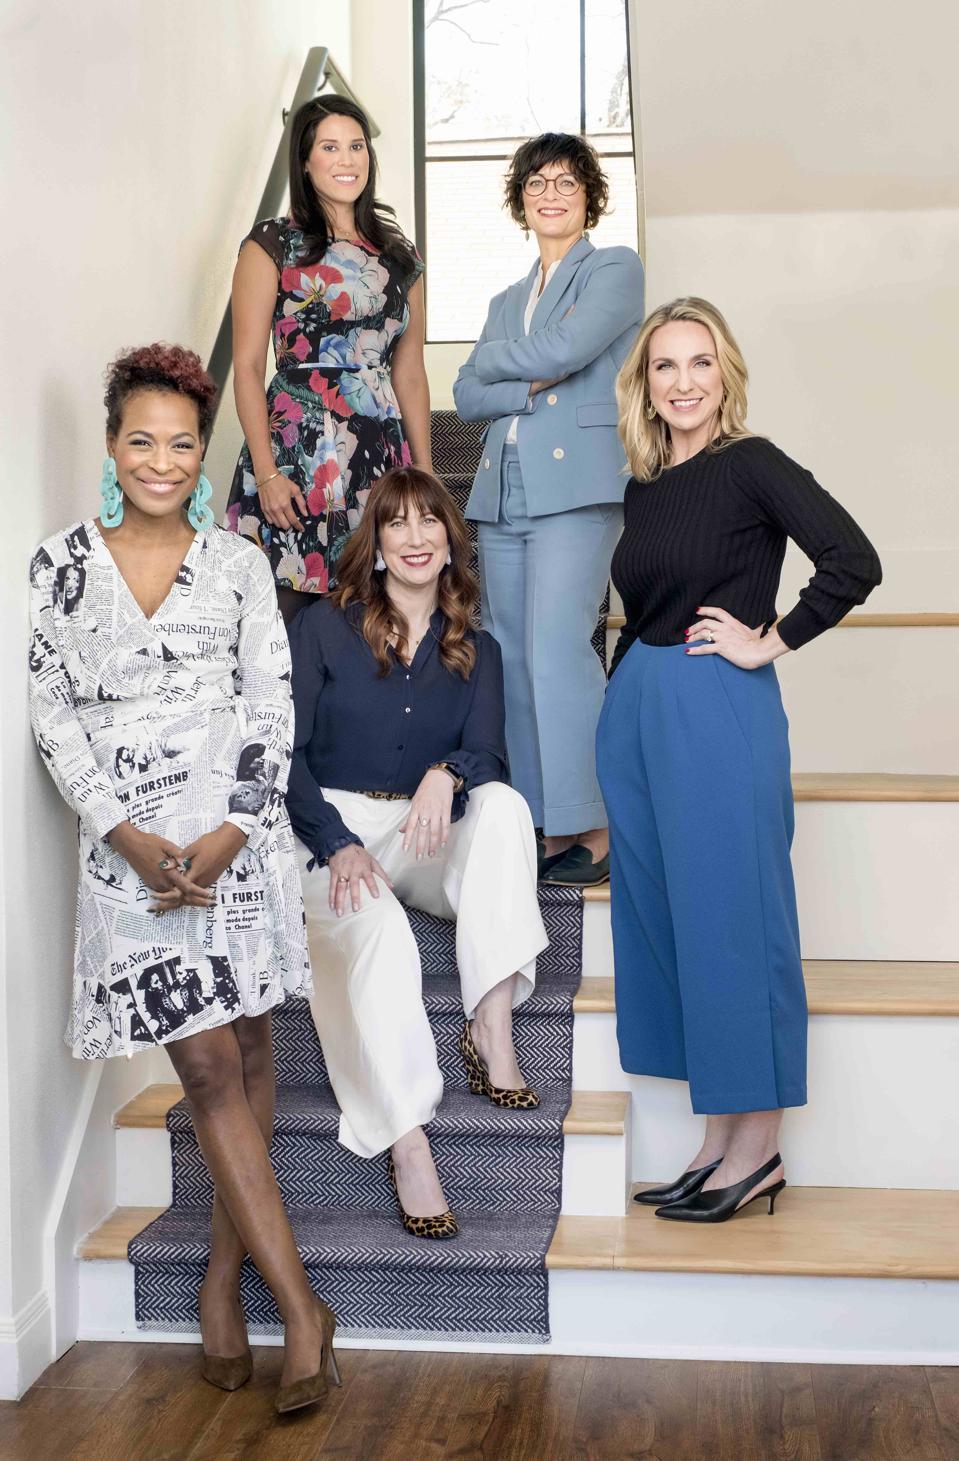 Founding Members of The 19th. Clockwise from bottom left, Errin Haines, Amanda Zamora, Andrea Valdez, Emily Ramshaw, and Johanna Derlega (seated)